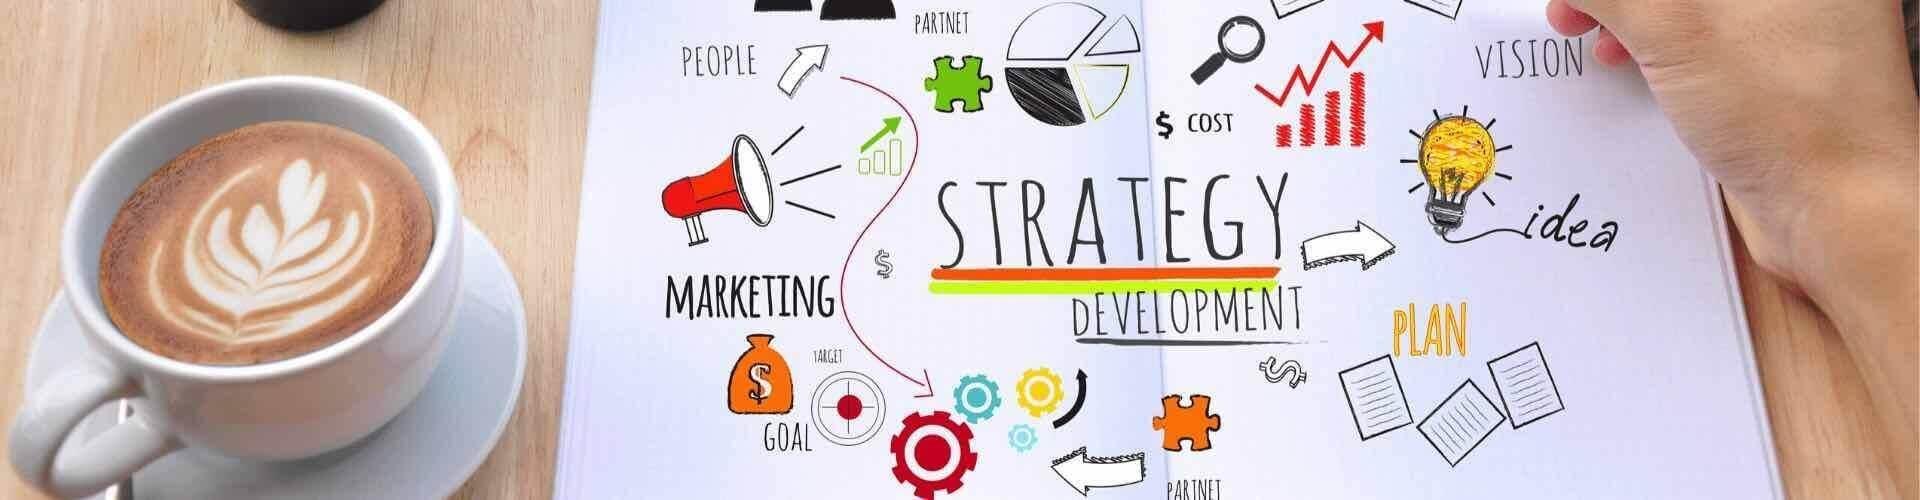 Marketing, branding, printing, photo and video shooting